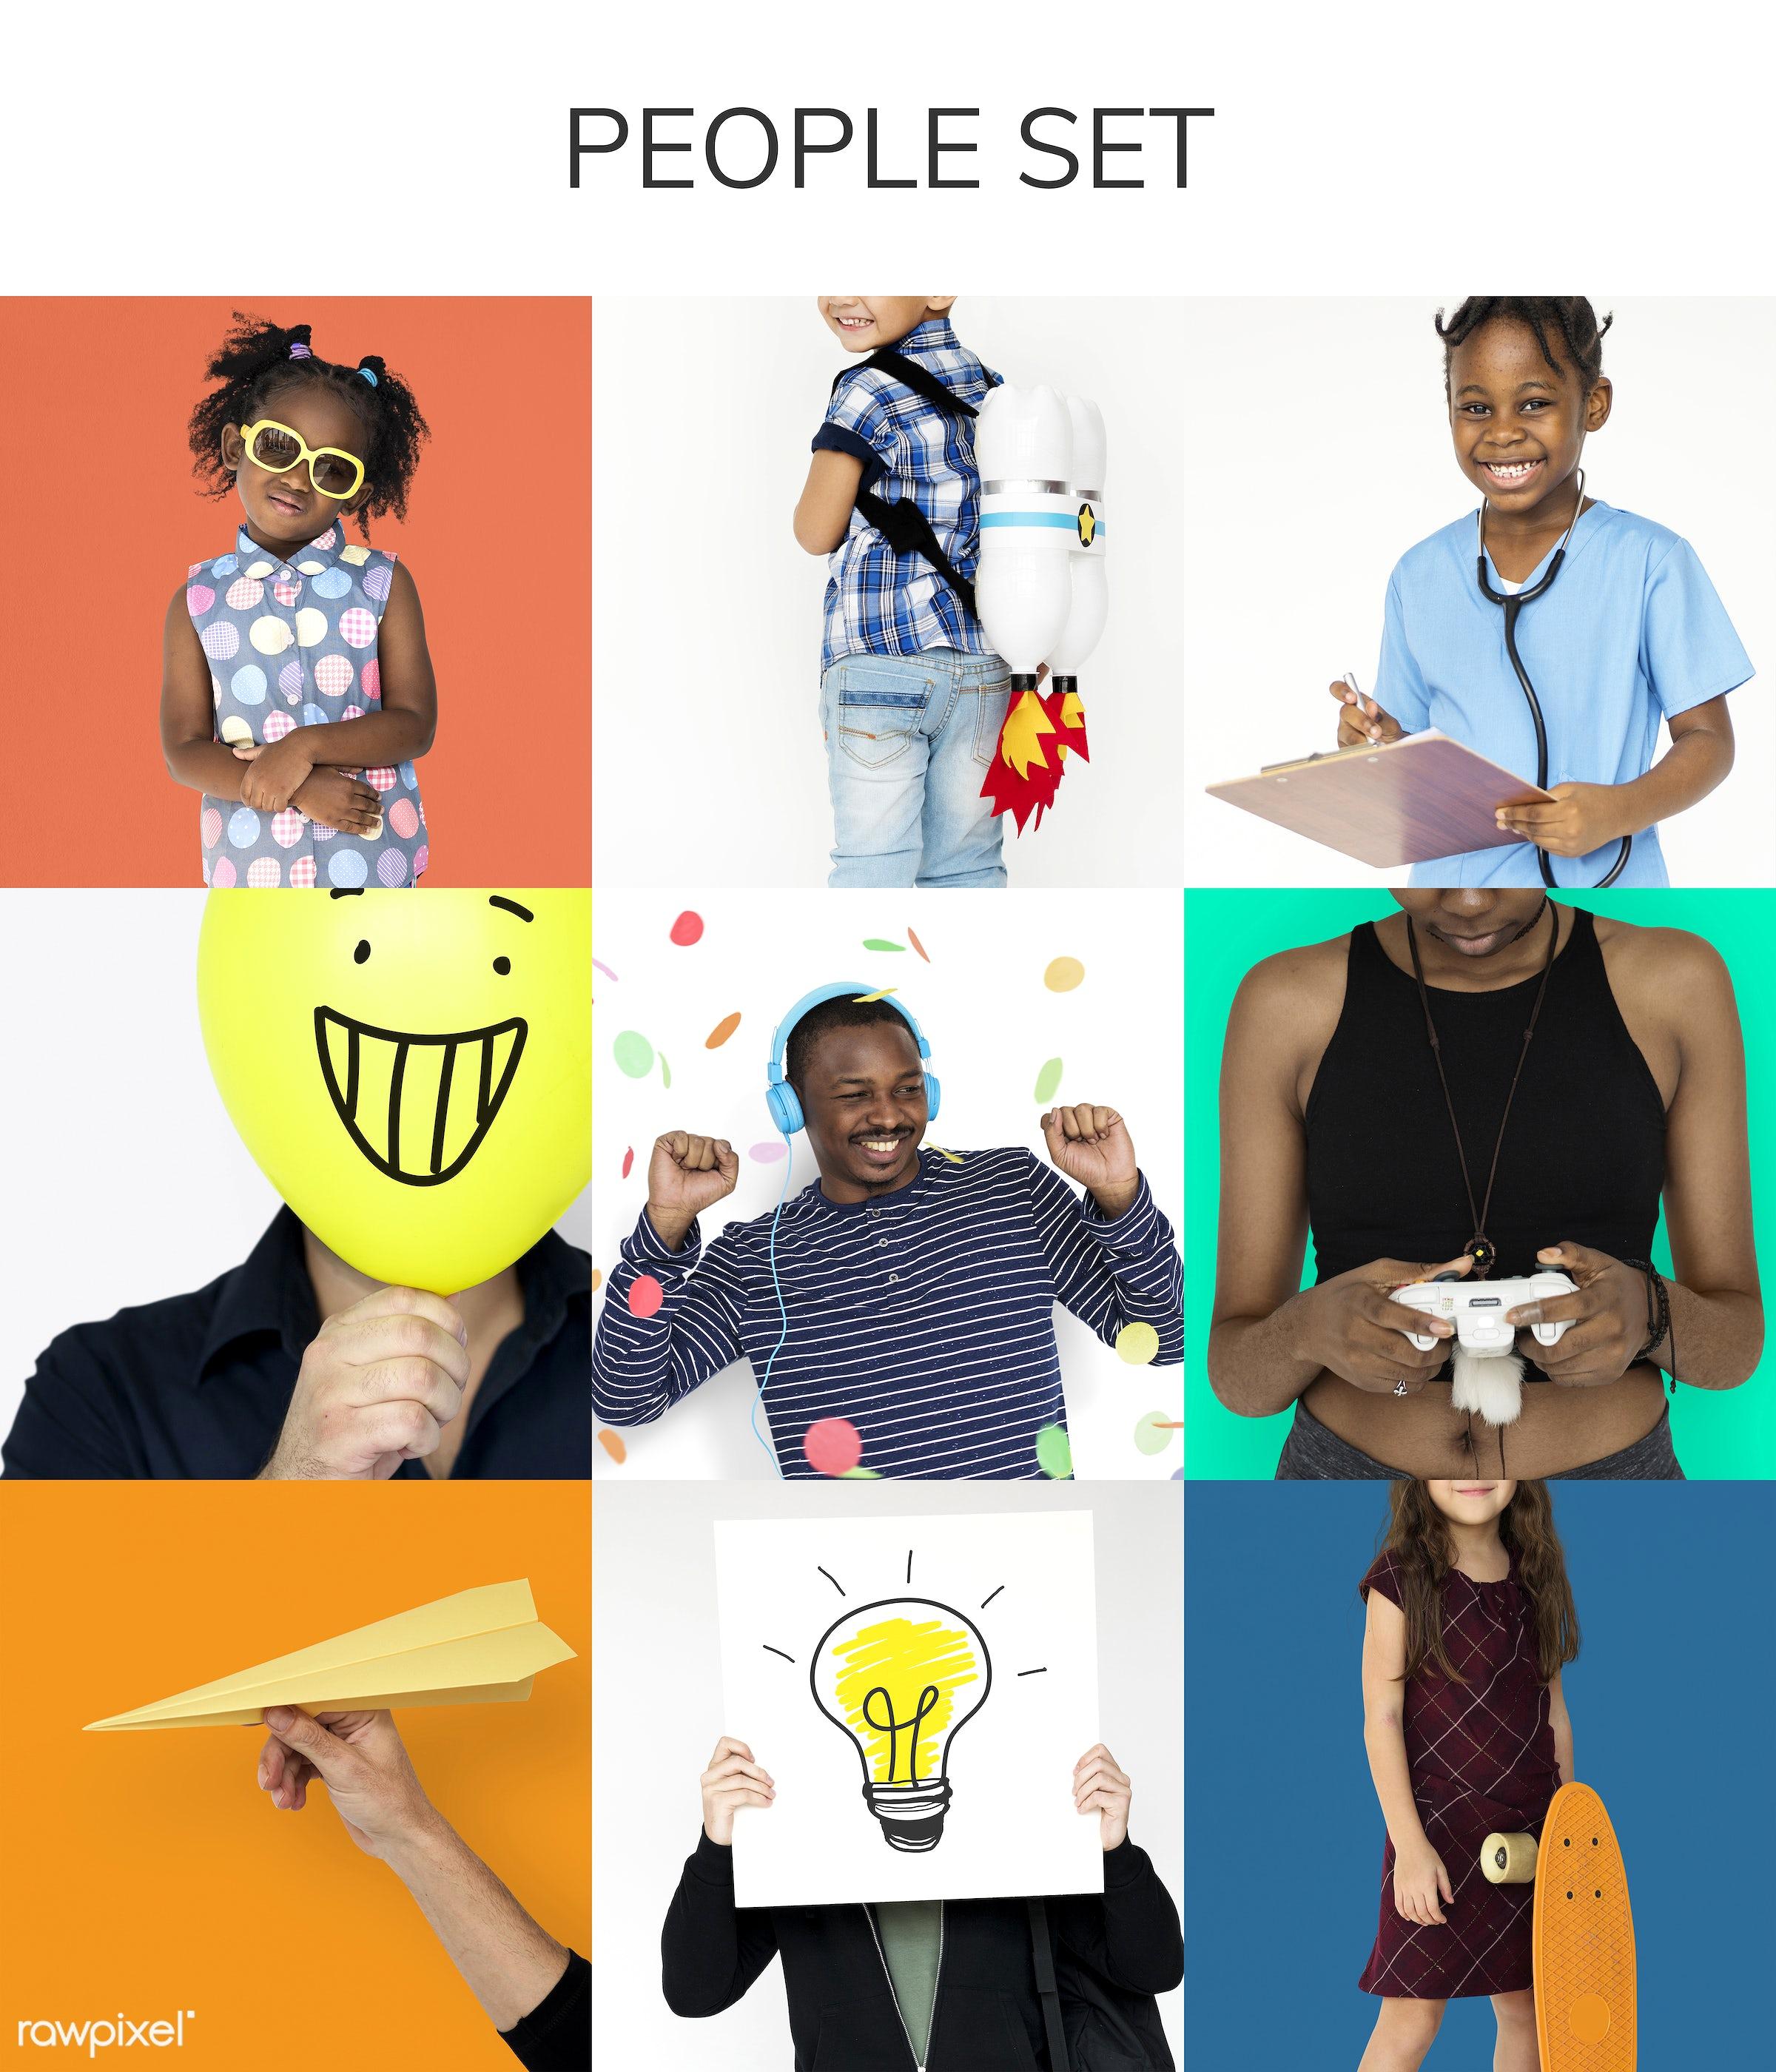 expression, studio, invention, creation, face, innovate, person, fresh ideas, set, motivation, imagination, creativity,...